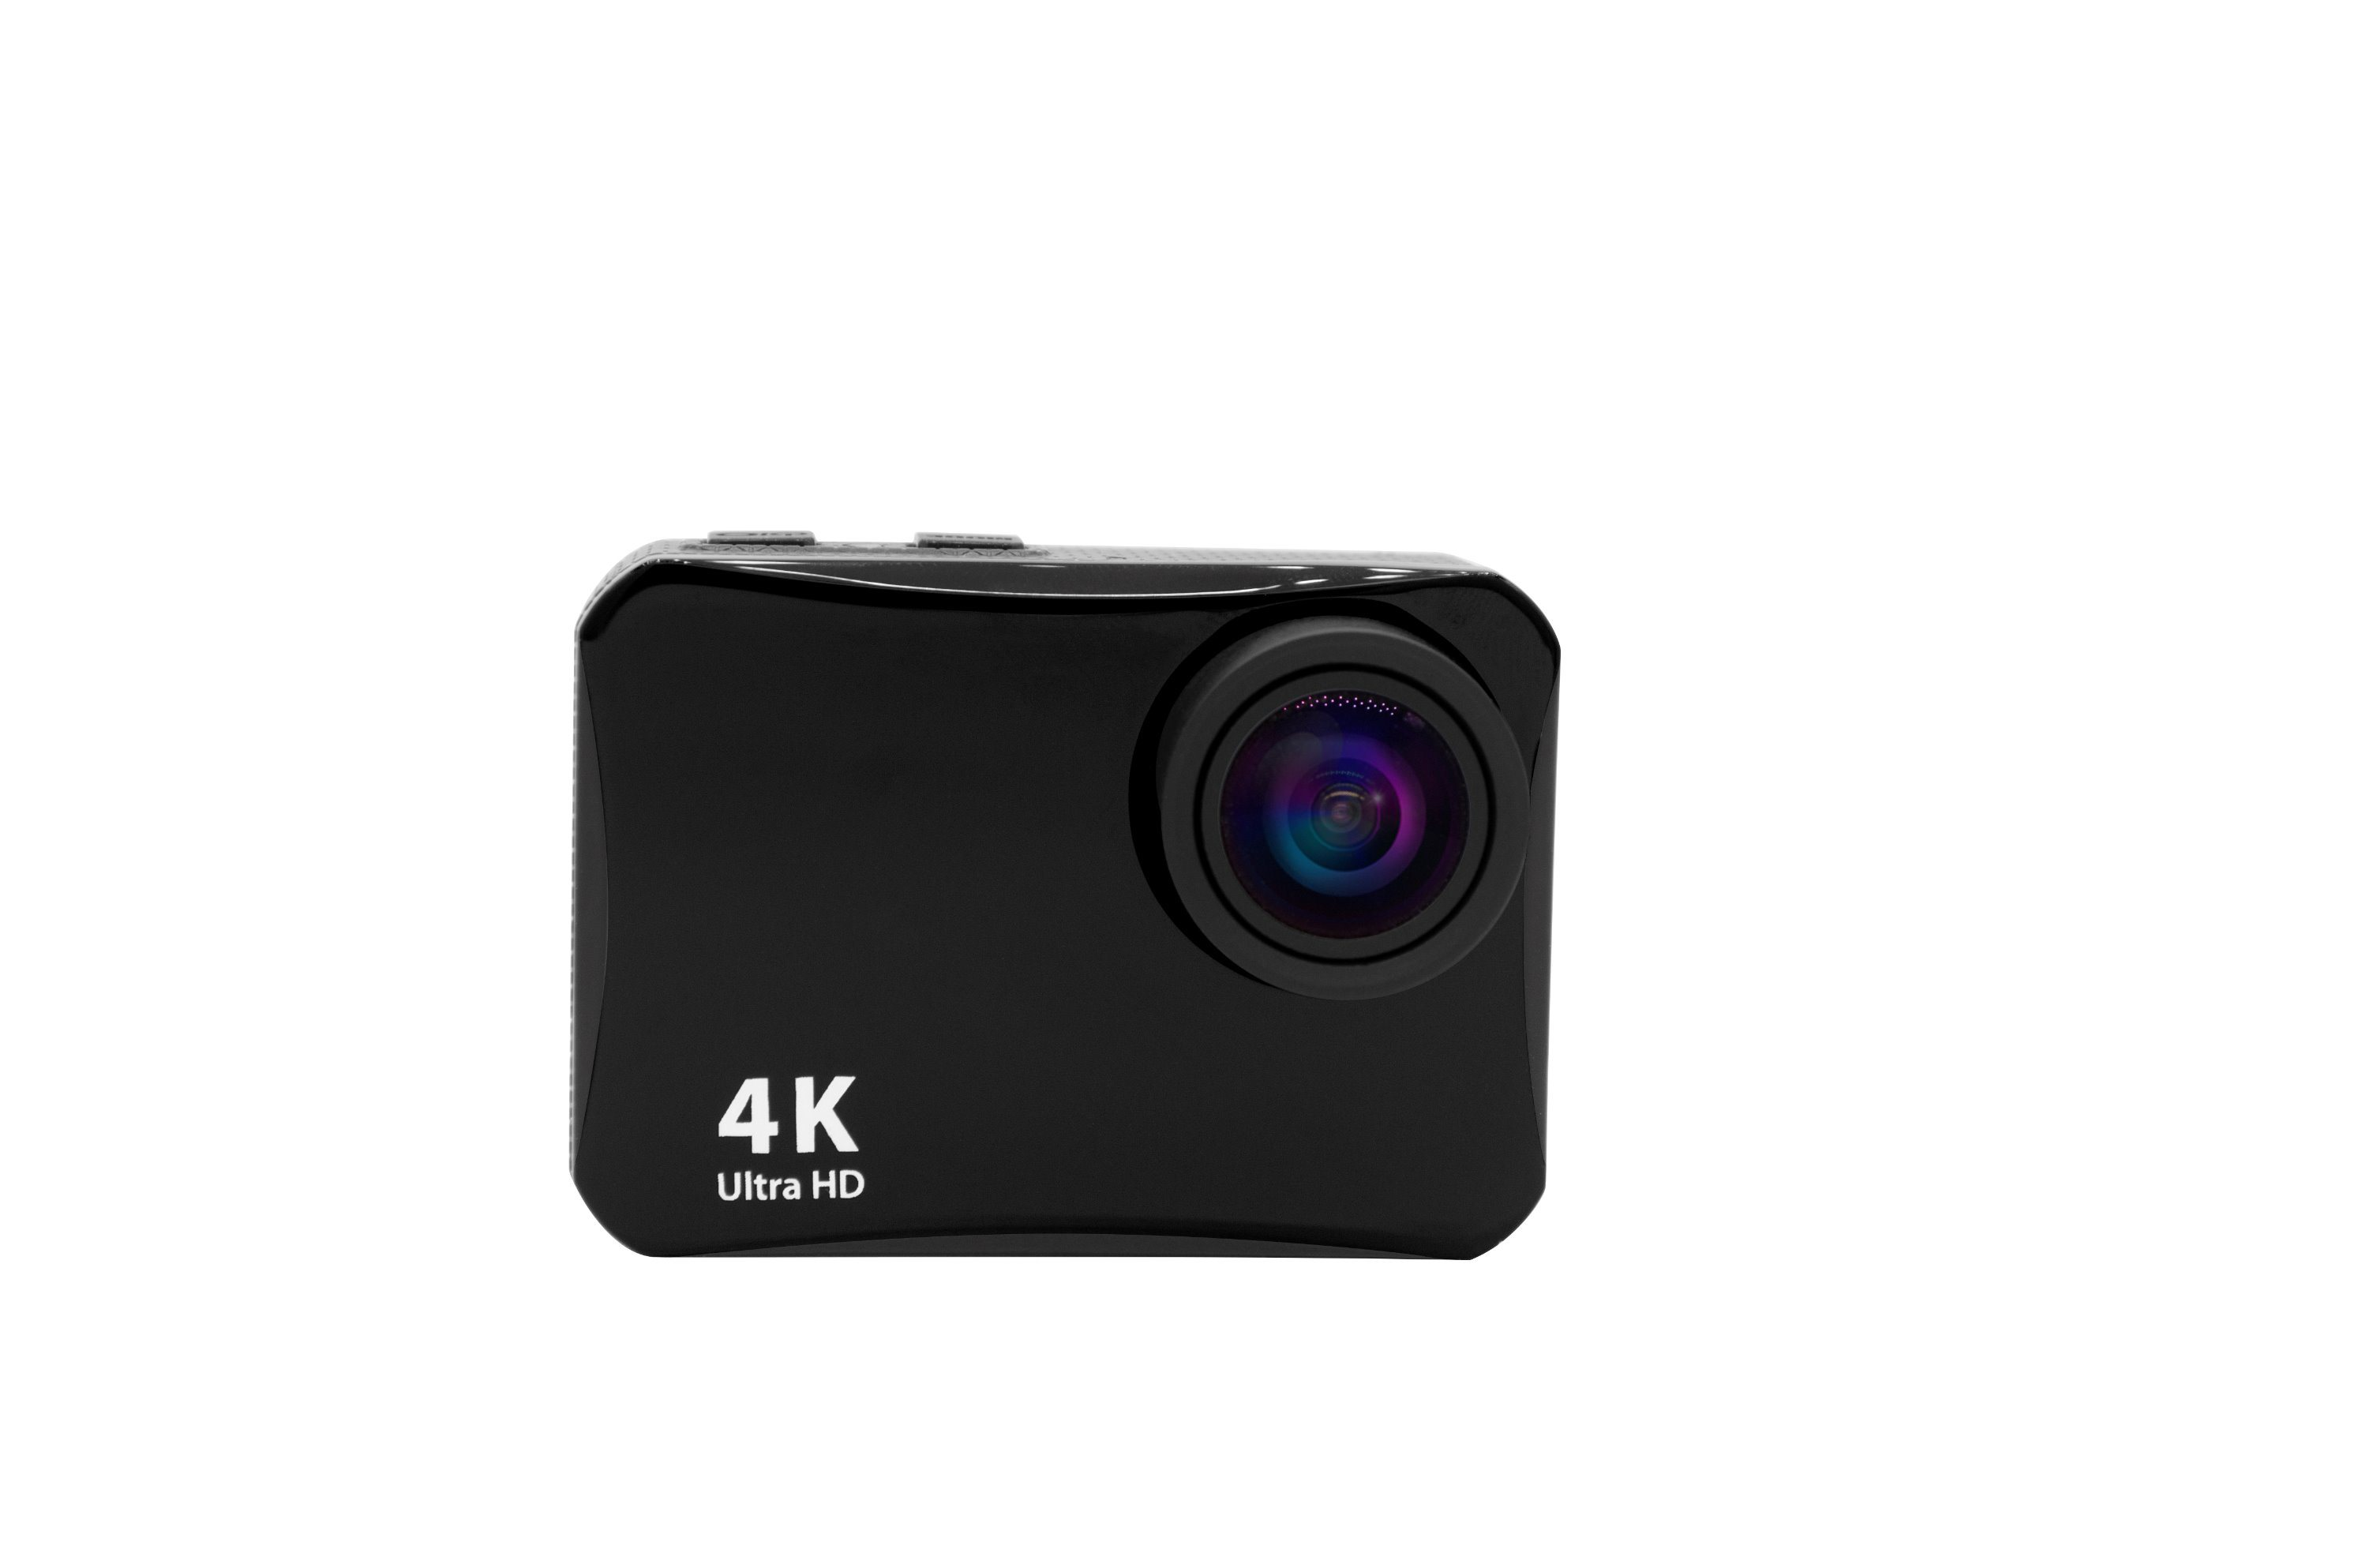 16MP 4k 60m Waterproof WiFi Action Sports Camera